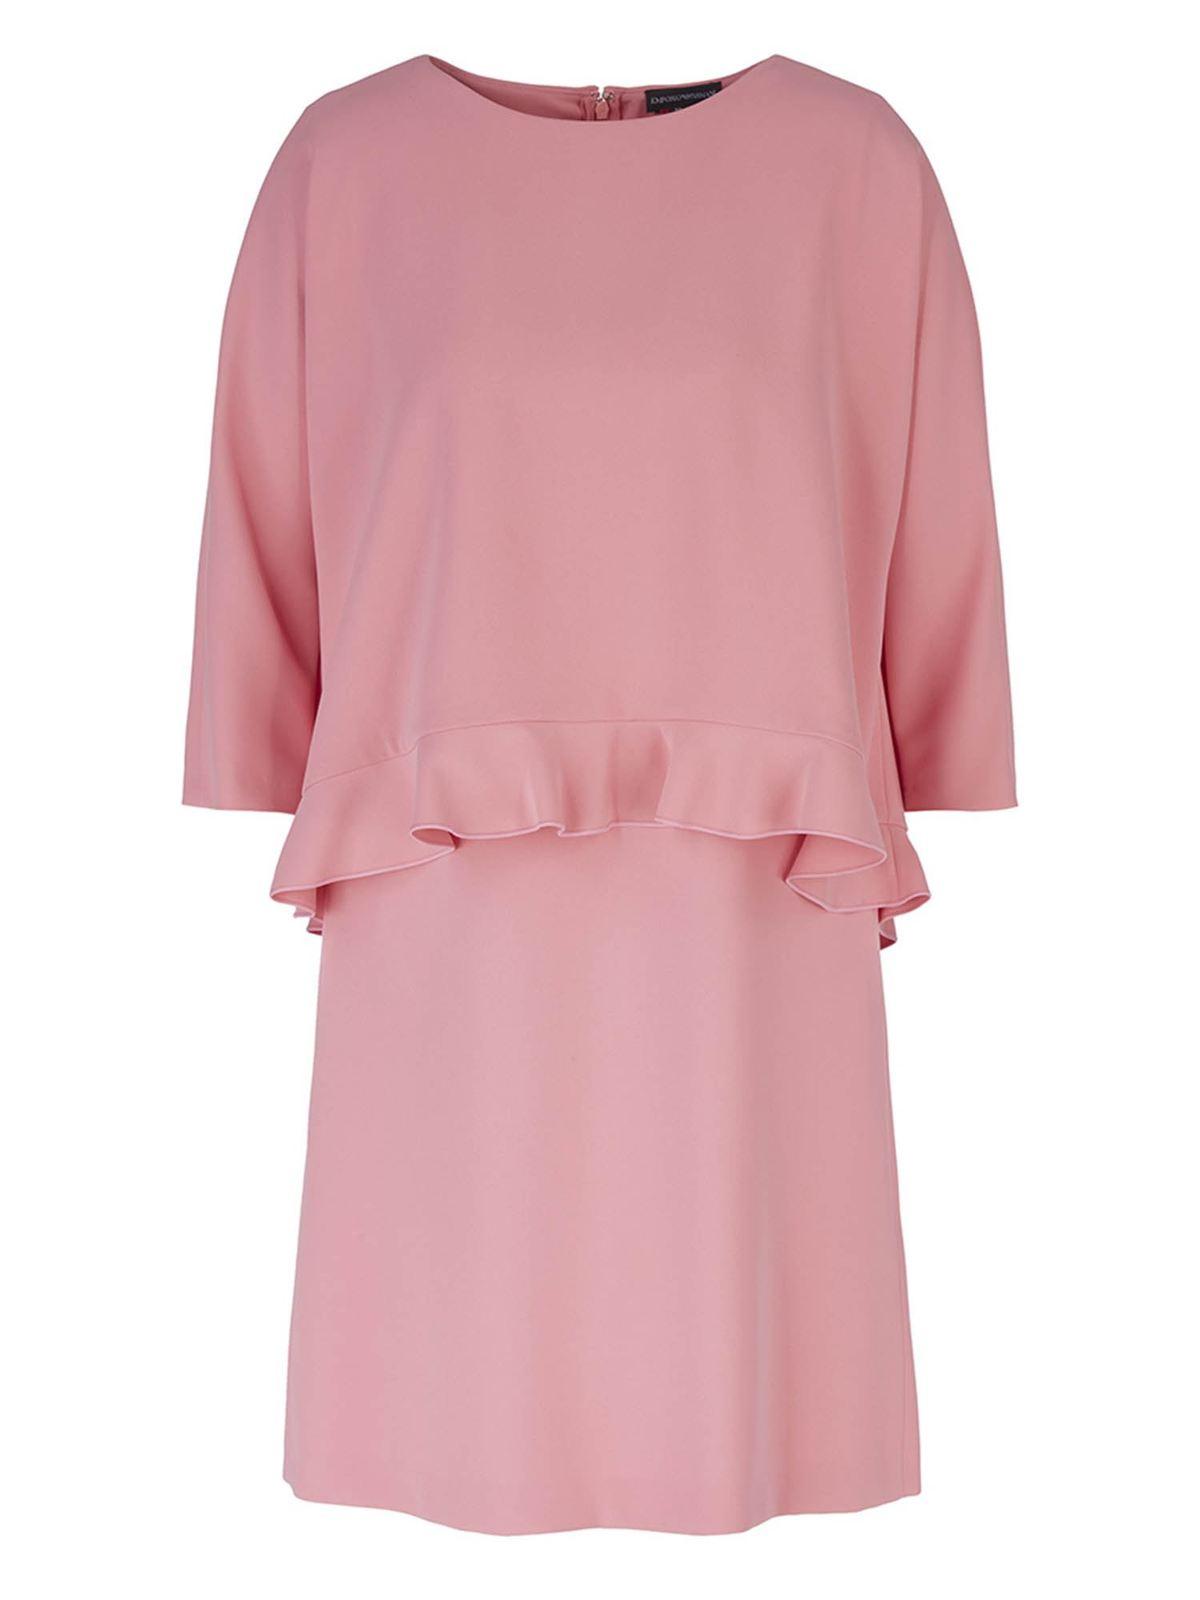 Emporio Armani FLOUNCE DRESS IN PINK